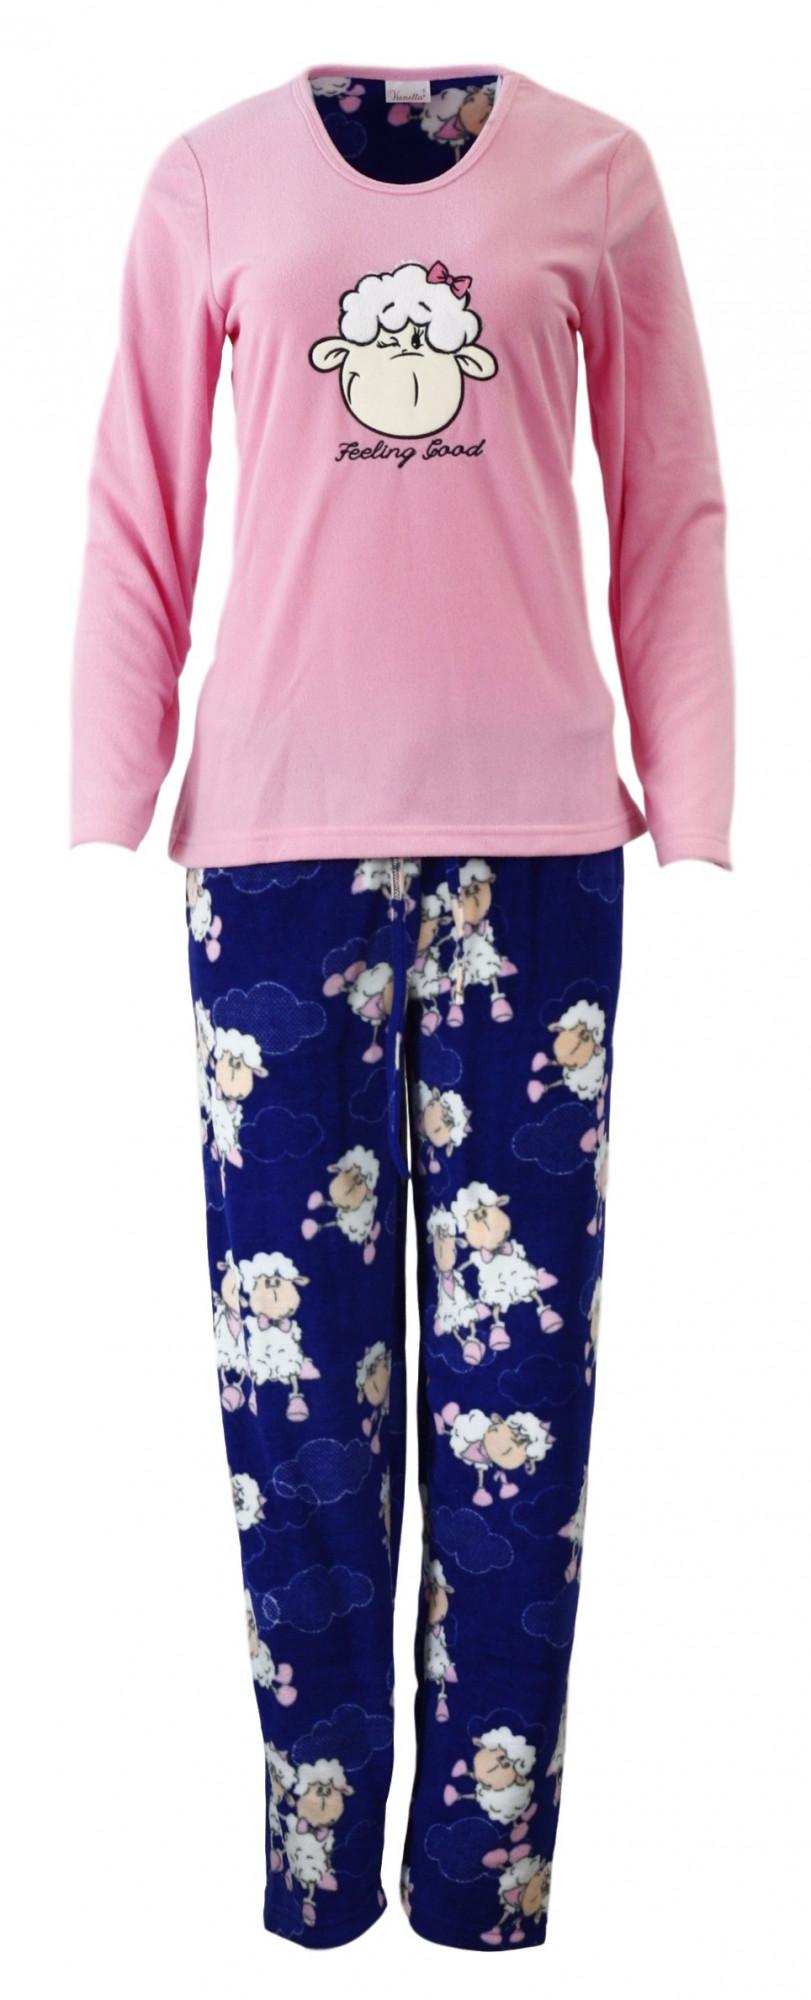 Dámské pyžamo 3214 - Vienetta Barva: růžová - modrá, Velikost: M